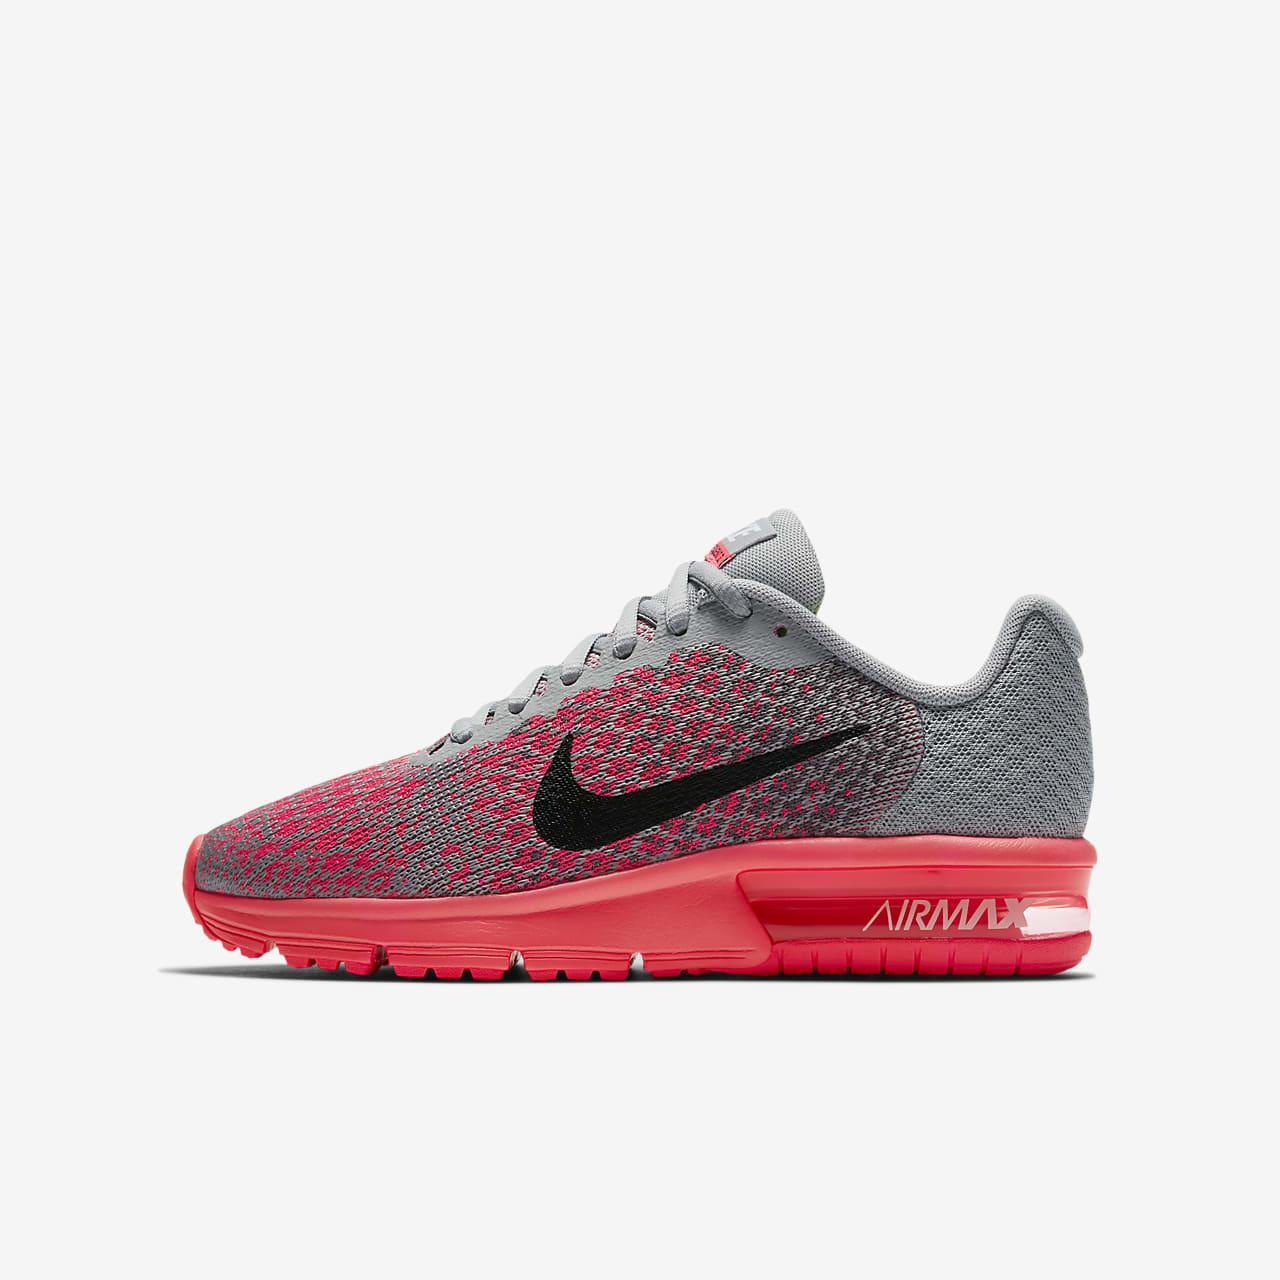 Scarpa da running Nike Air Max Sequent 2 - Ragazzi